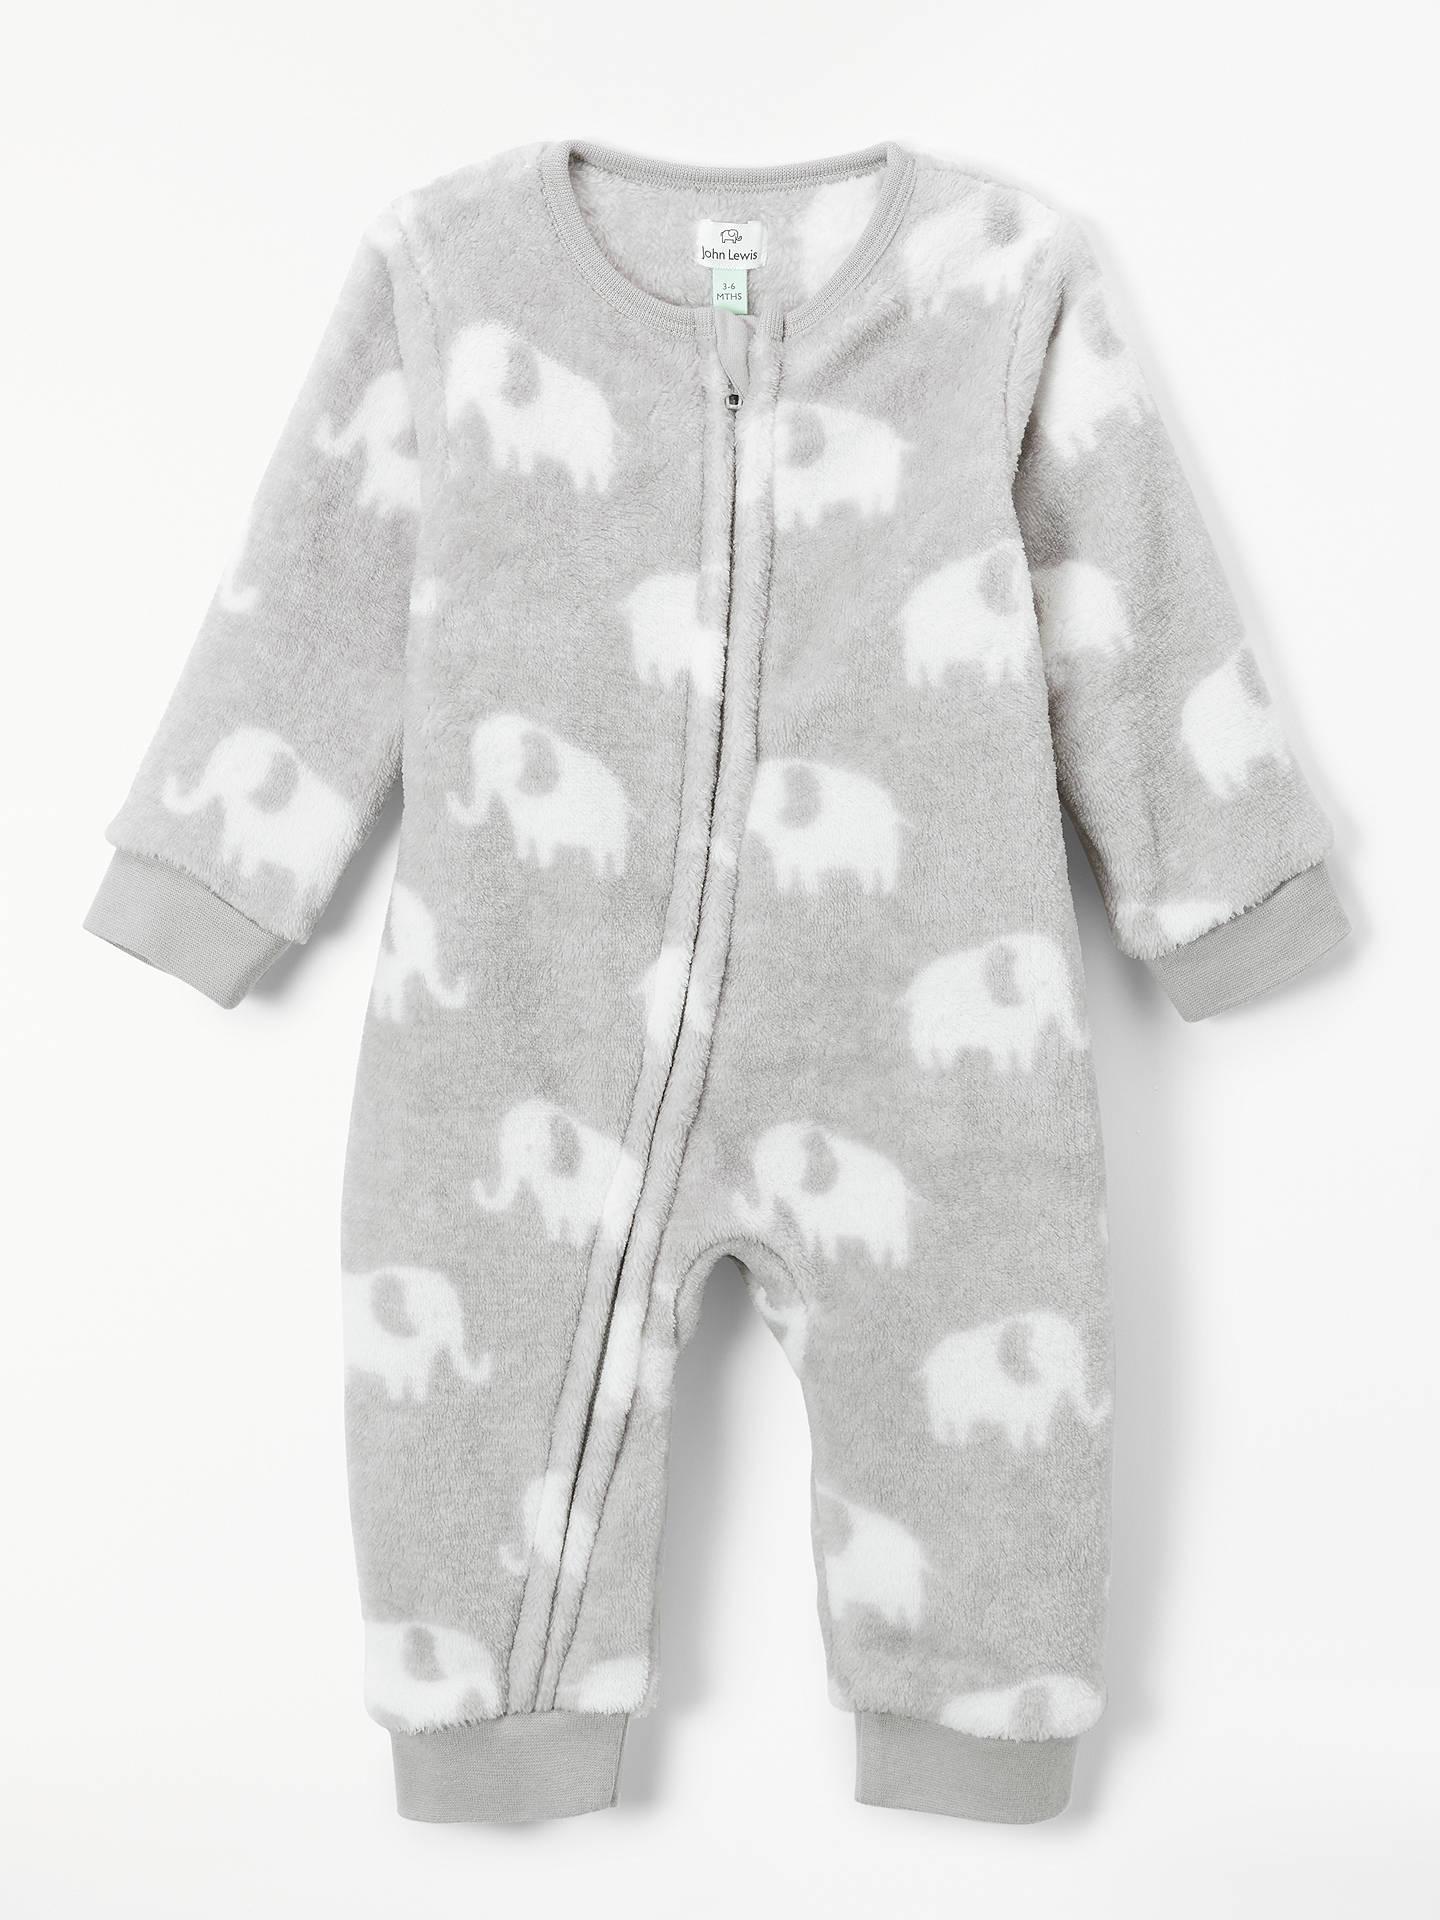 ead04a5a4cfc John Lewis   Partners Baby Elephant Fleece Onesie